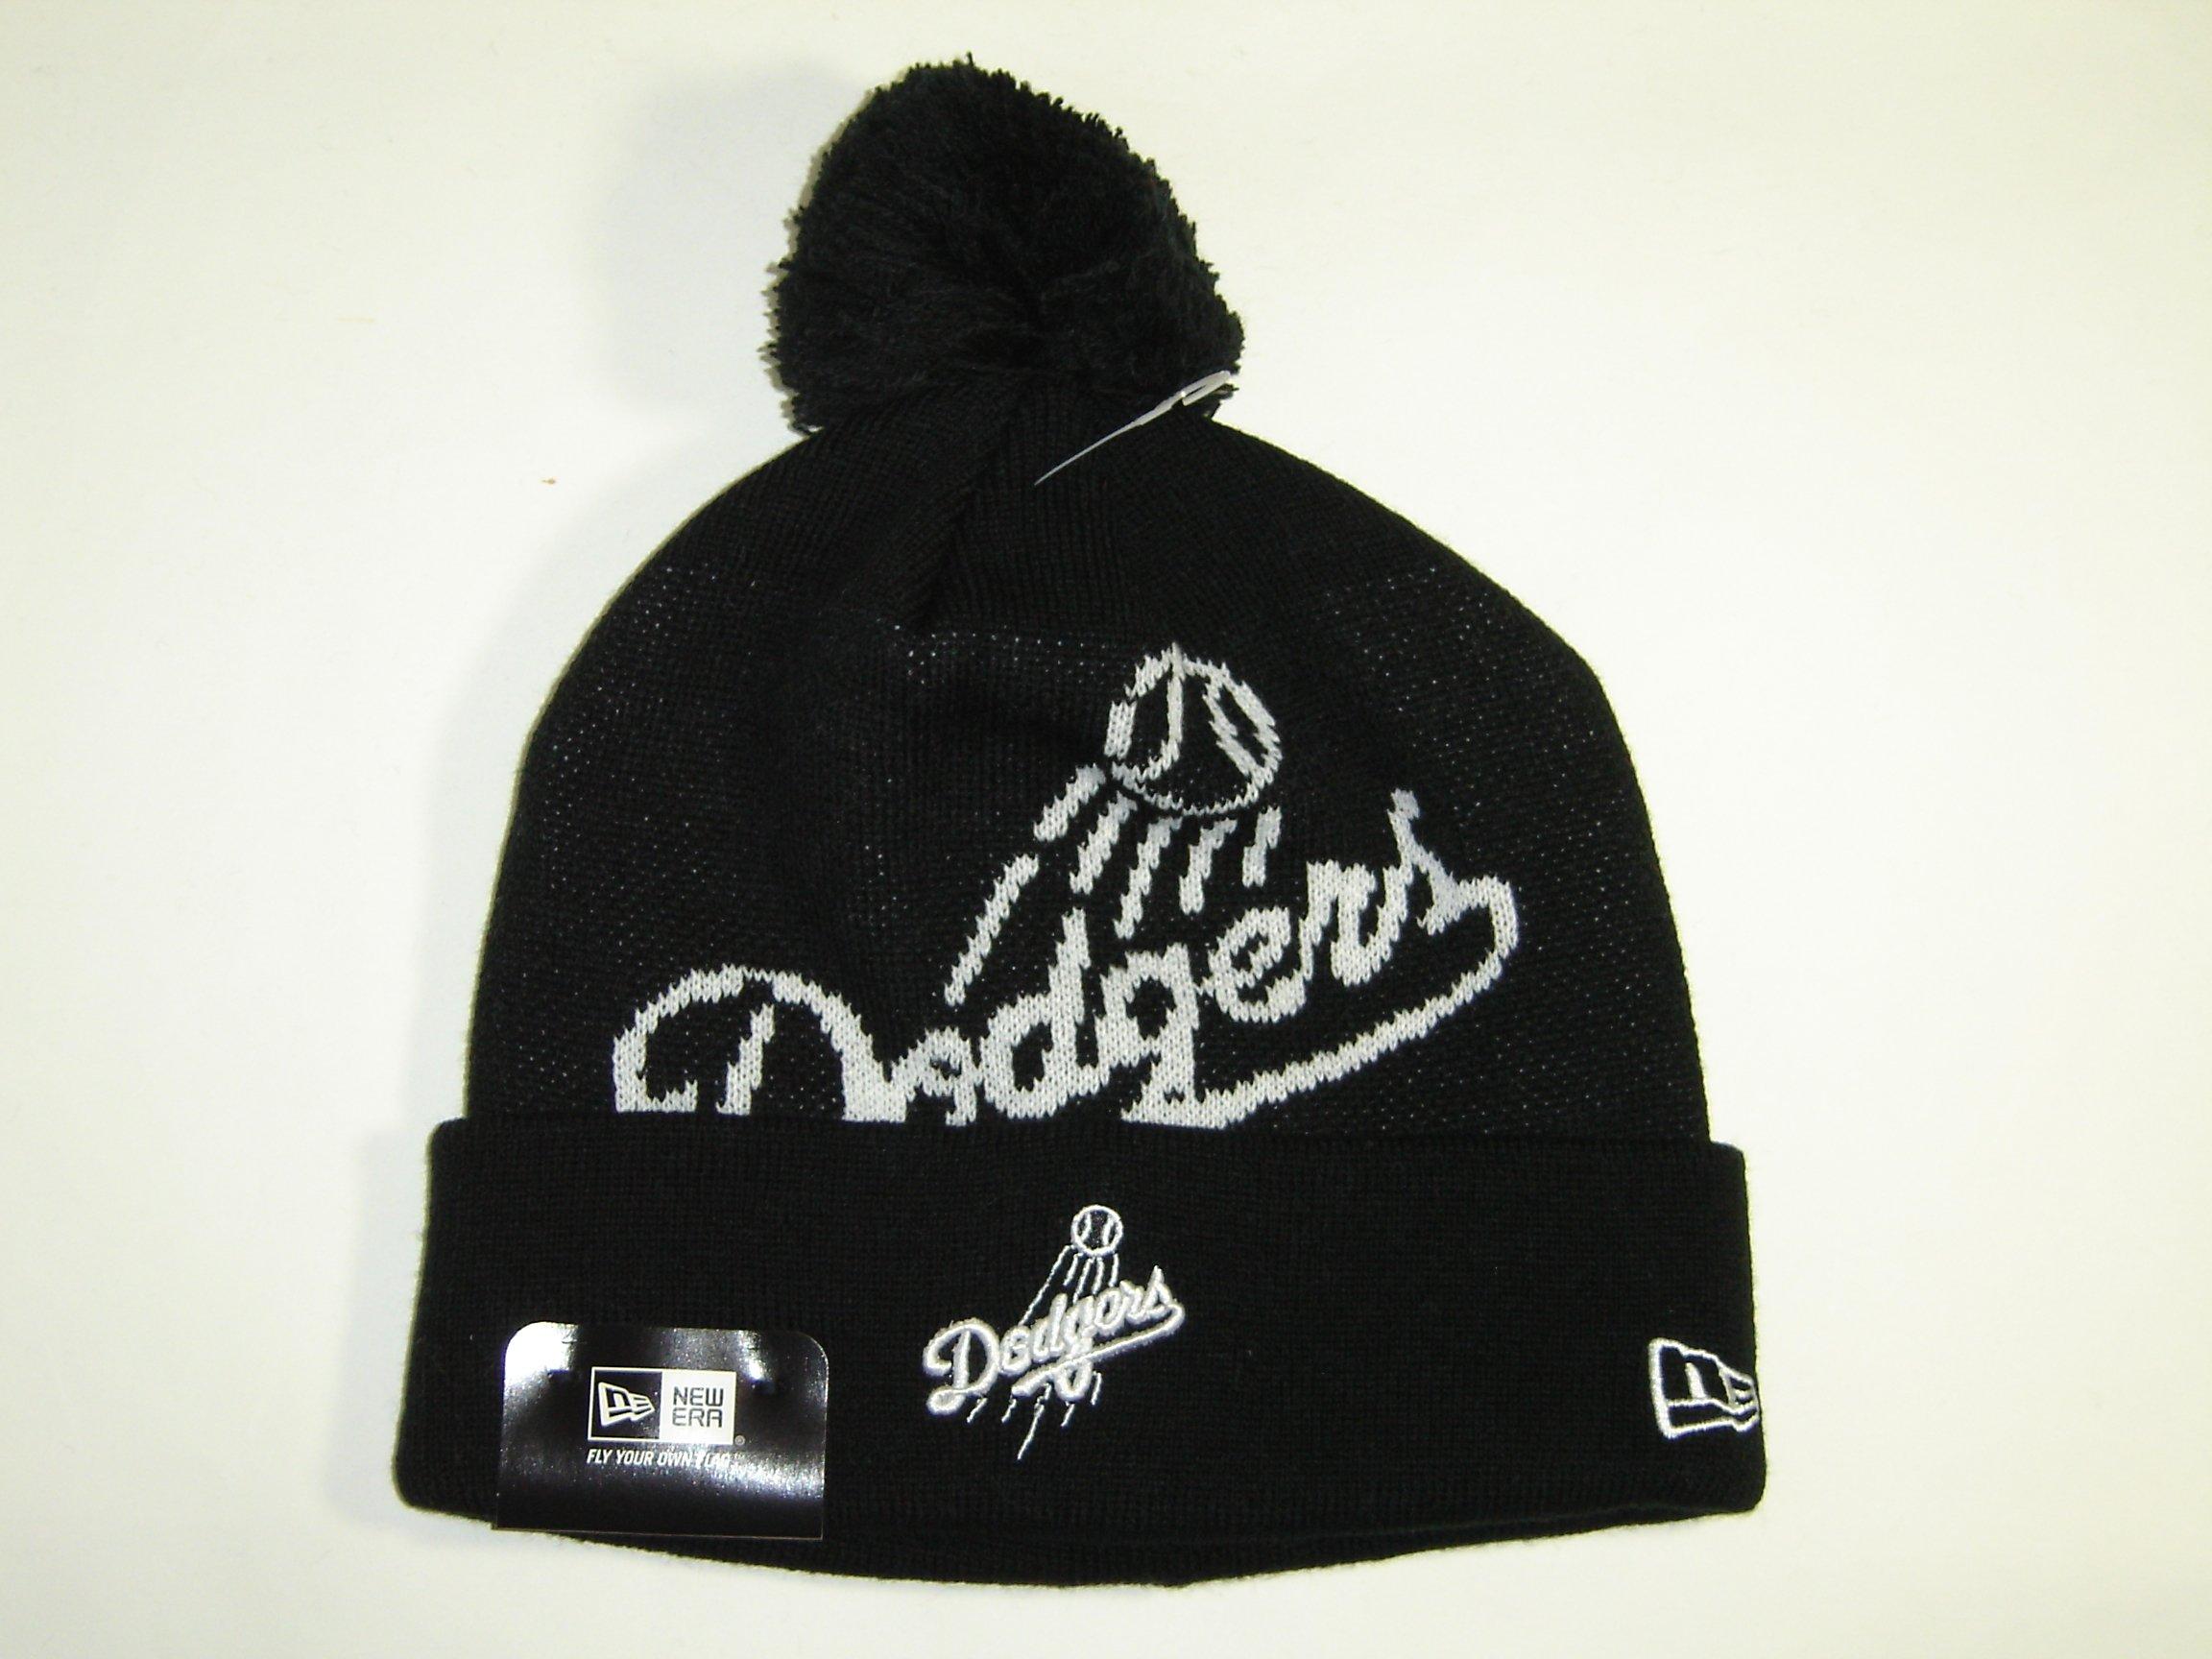 size 40 c7525 74bfc Get Quotations · New Era MLB Los Angeles Dodgers Logo Cuffed Knit Pom Beanie  Cap NewEra